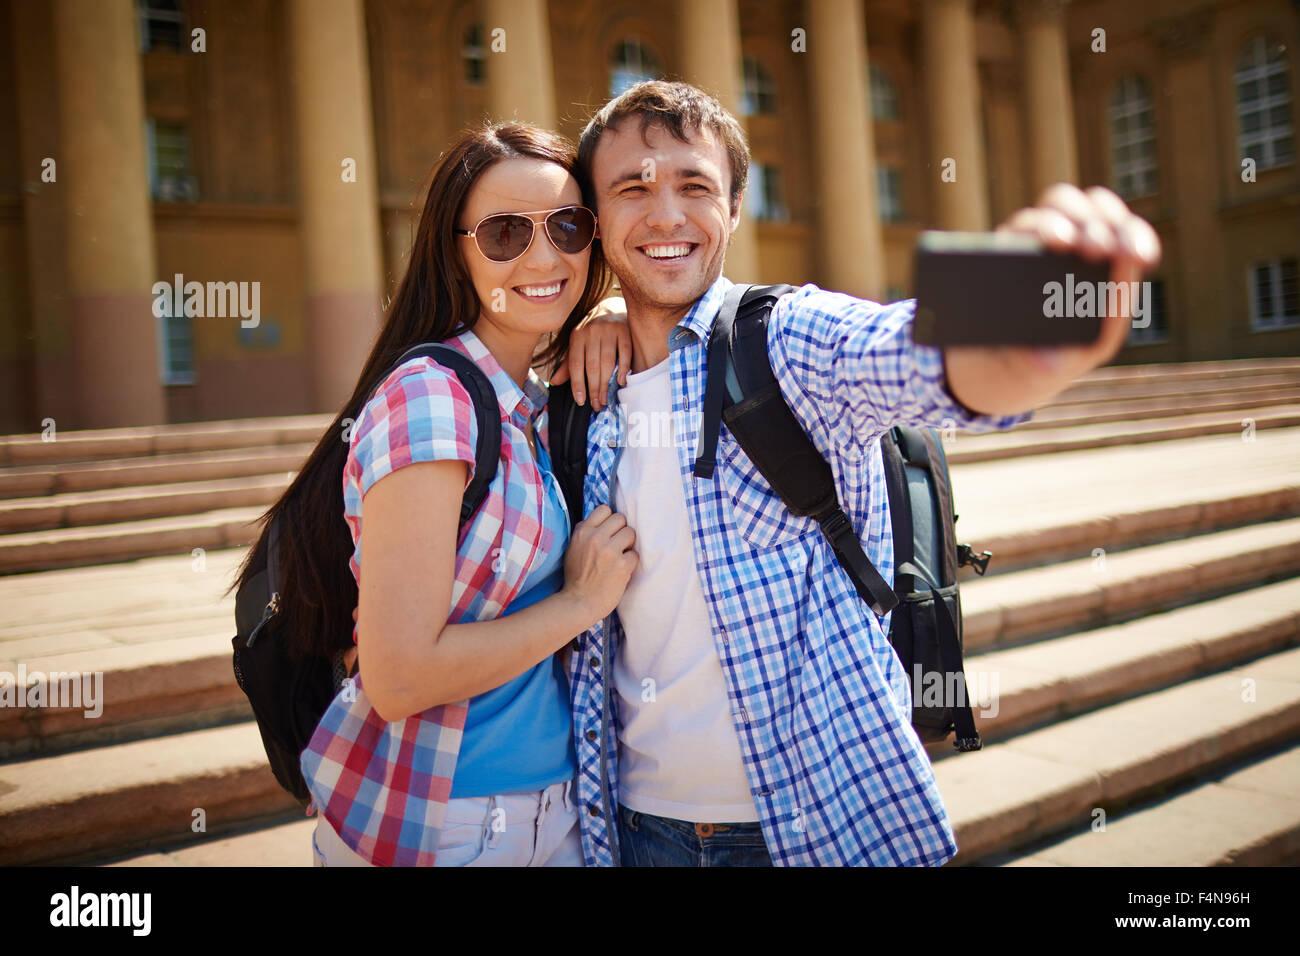 Pareja joven aventurero haciendo sus selfie durante el viaje Imagen De Stock